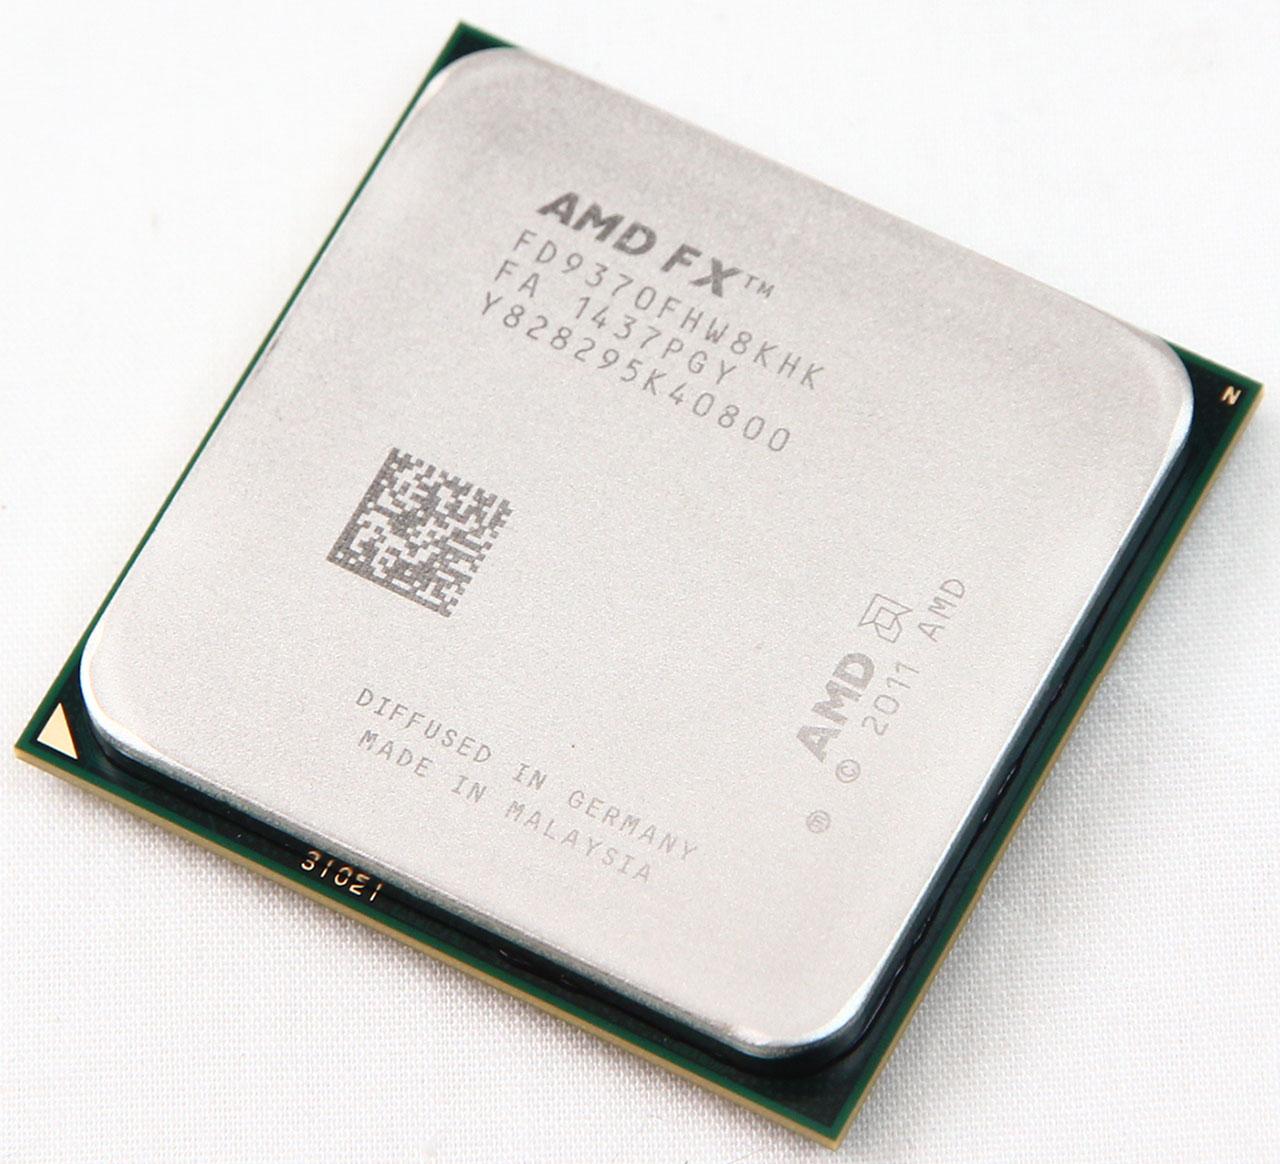 AMD FX-9370 (Vishera) 8-Core Processor Review 1